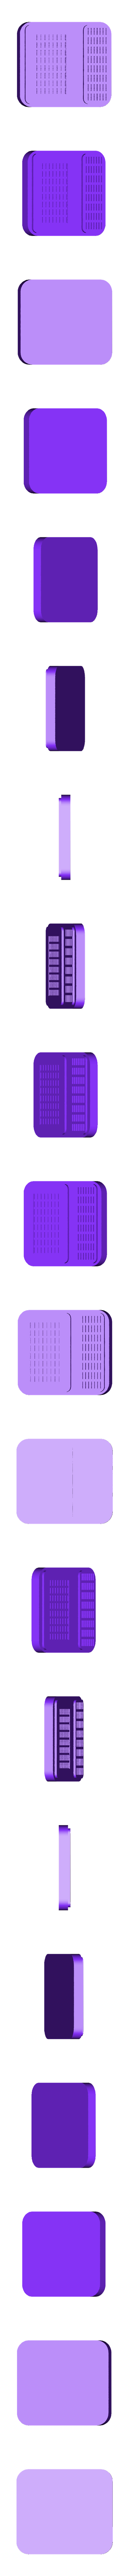 Trasparent_BackLight.stl Descargar archivo STL CHEVY VAN G20 RC BODY SCALER AXIAL MST TRX4 RC4WD • Modelo para imprimir en 3D, ilyakapitonov